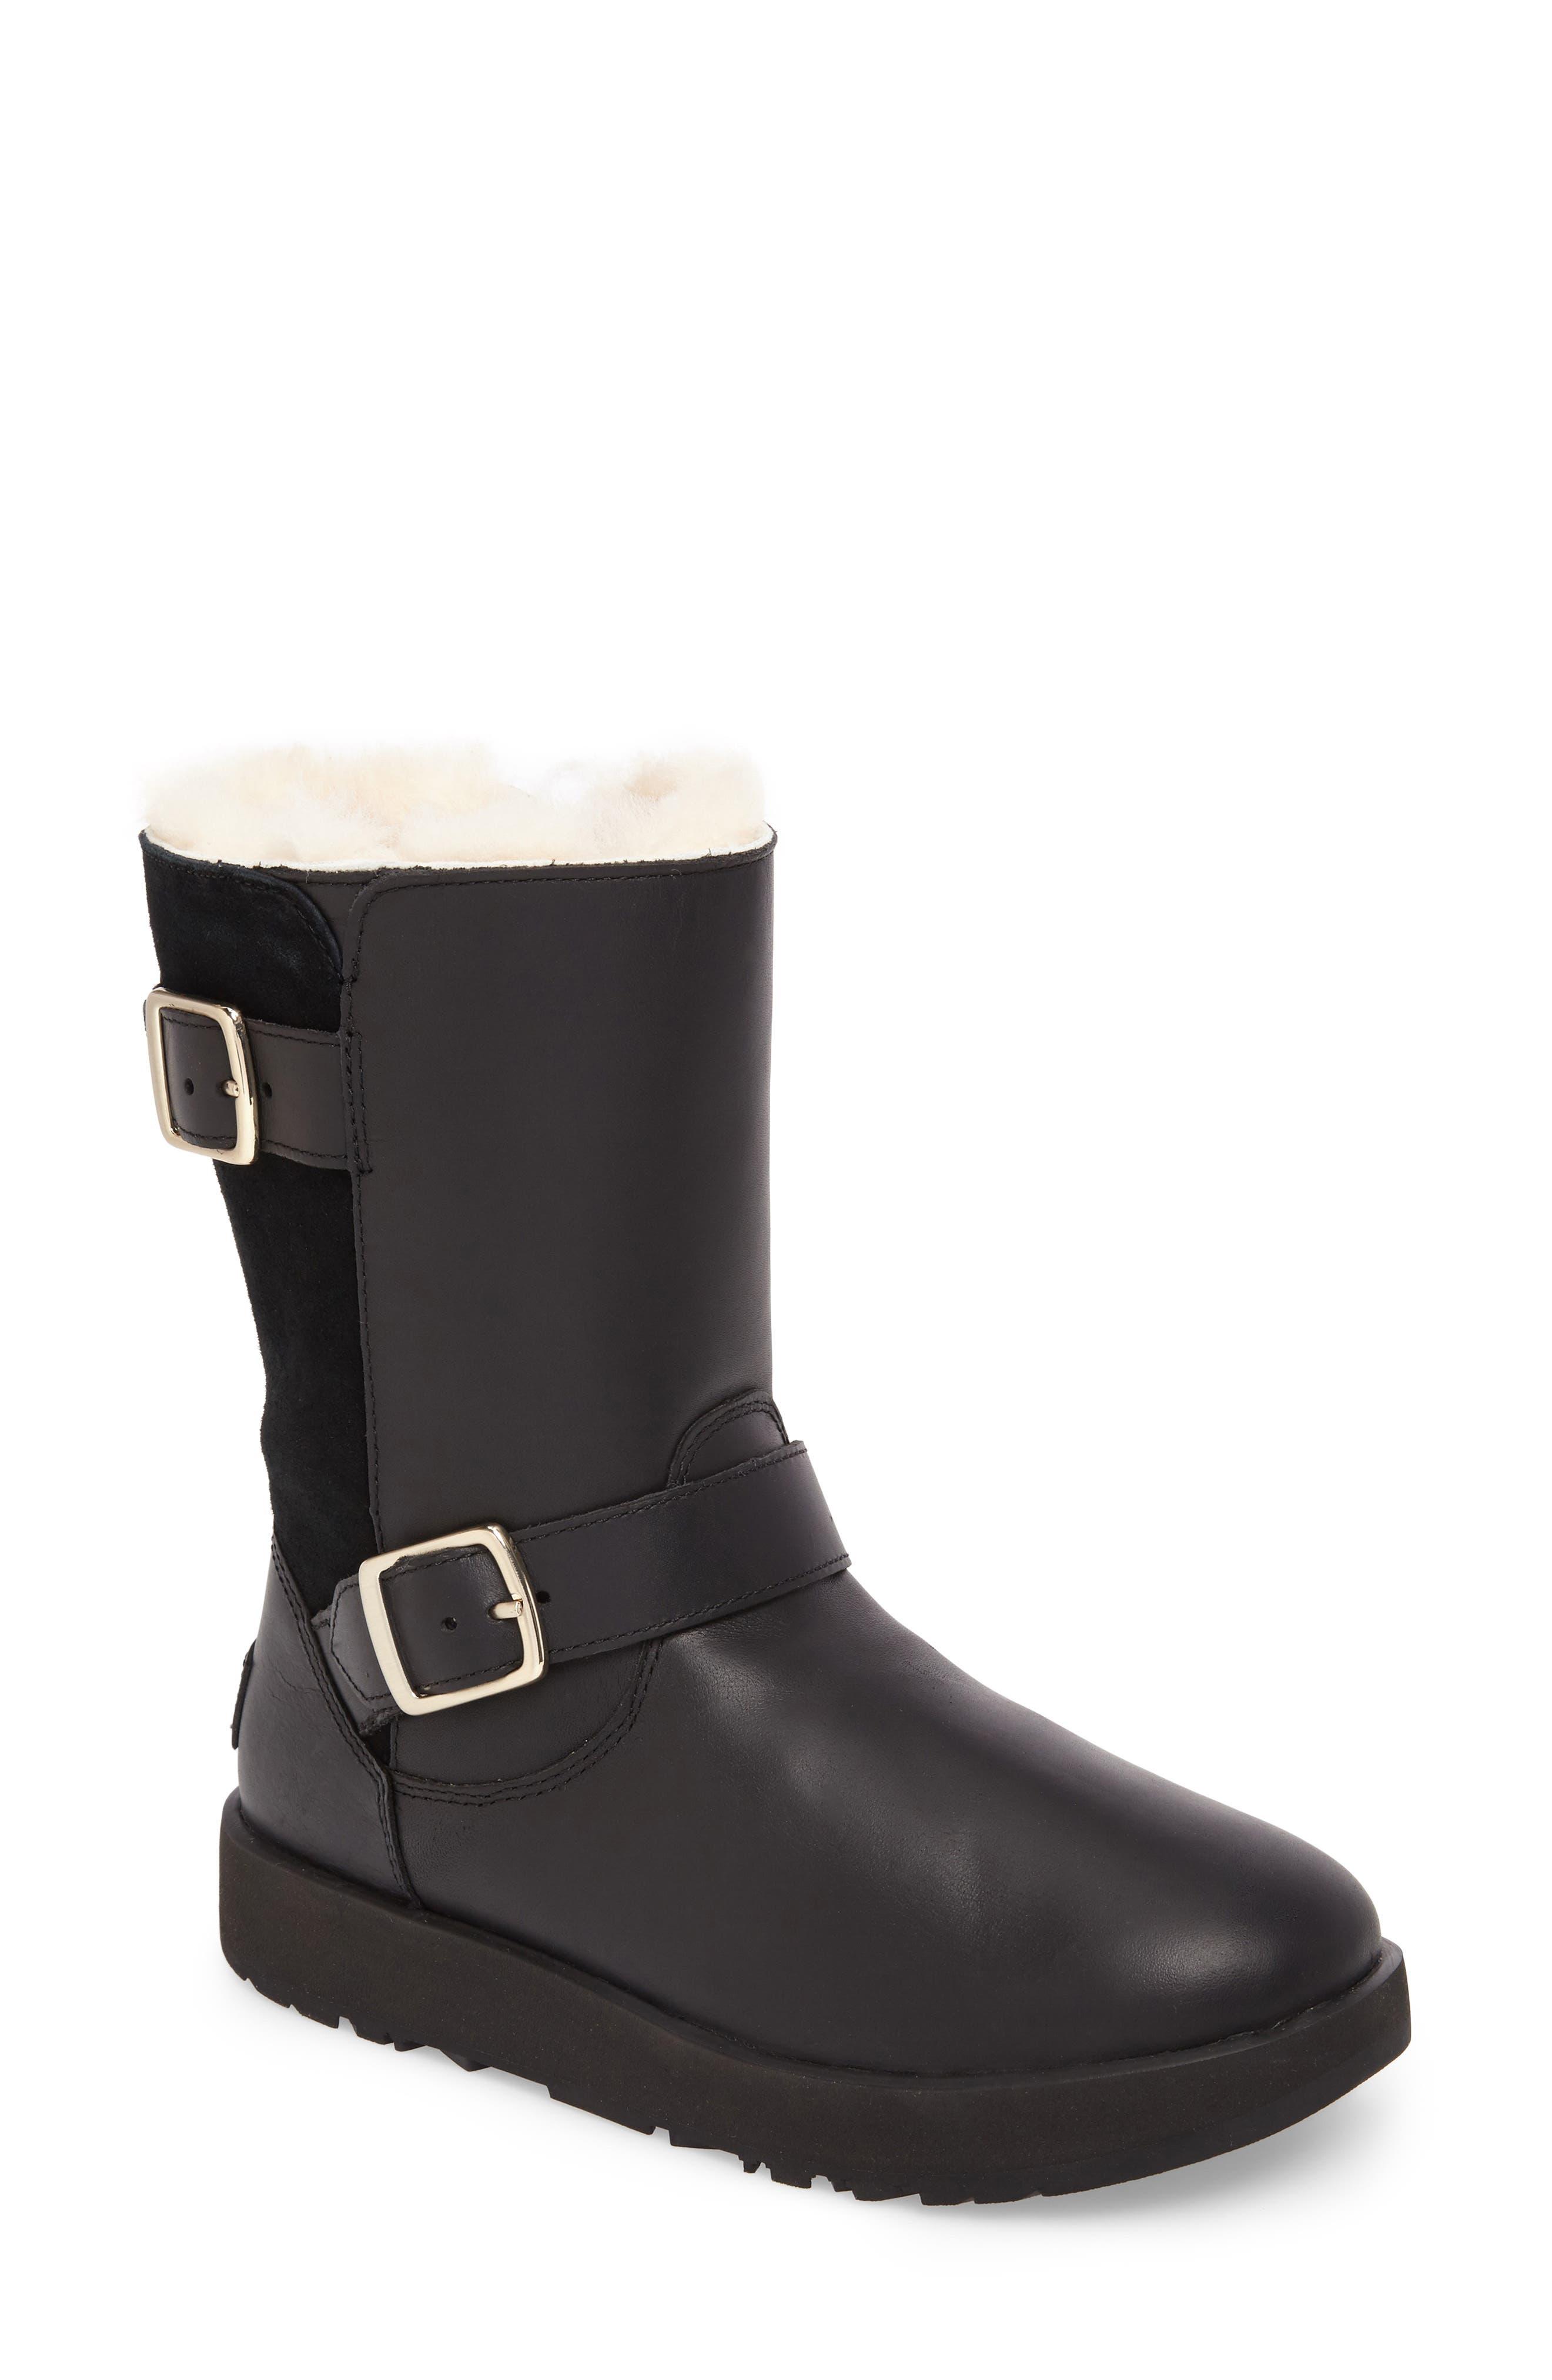 Breida Waterproof Boot,                             Main thumbnail 1, color,                             Black Leather